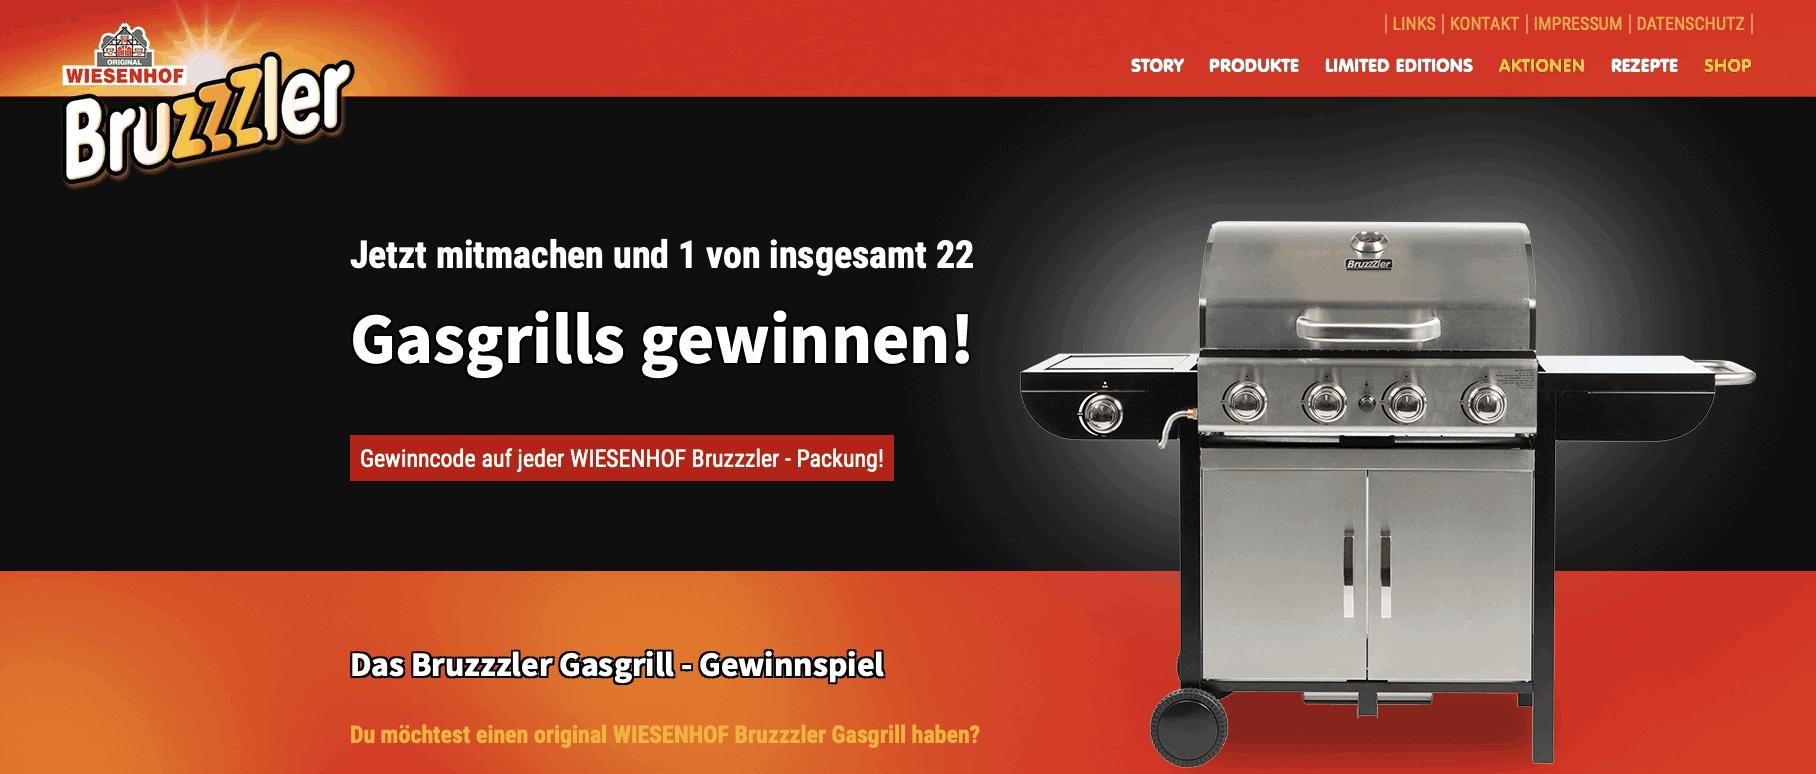 Wiesenhof Bruzzler Gewinnspiel-Cases FMCG Food